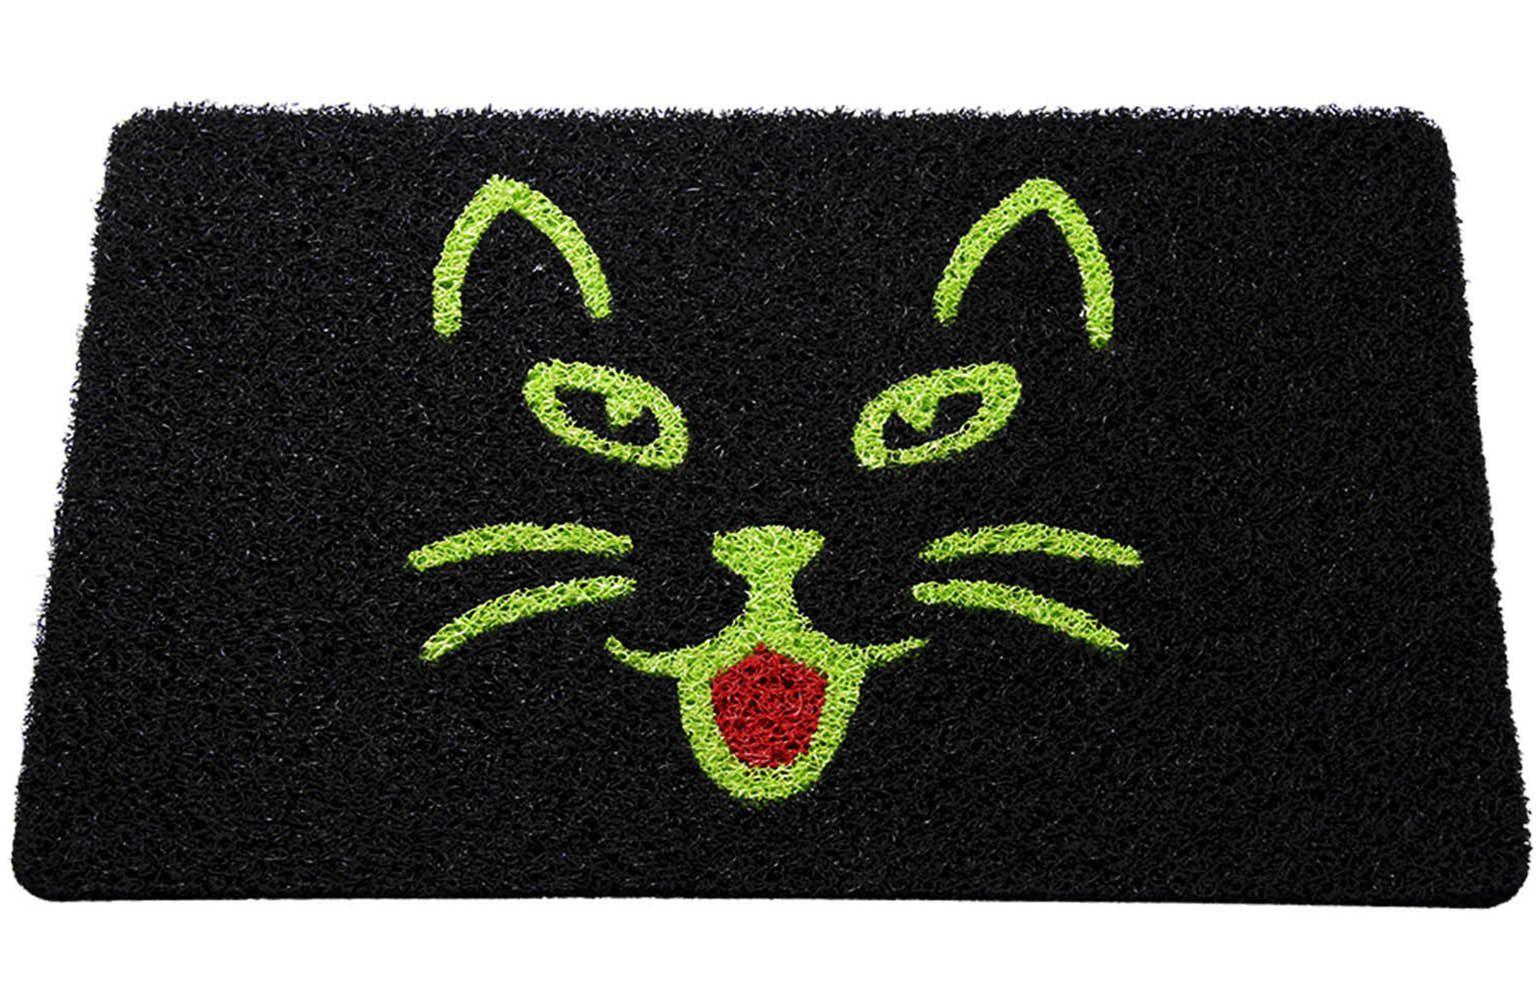 Tapete capacho gato 60x40 Cm  - Zap Tapetes e Capachos Personalizados